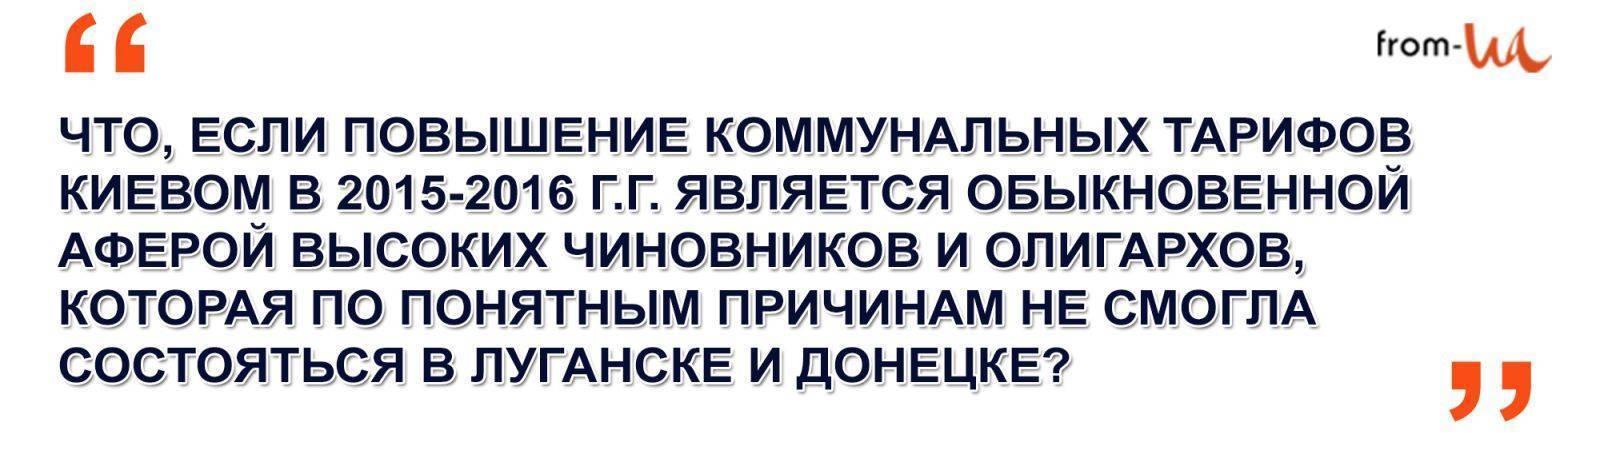 Тарифная война против граждан Украины